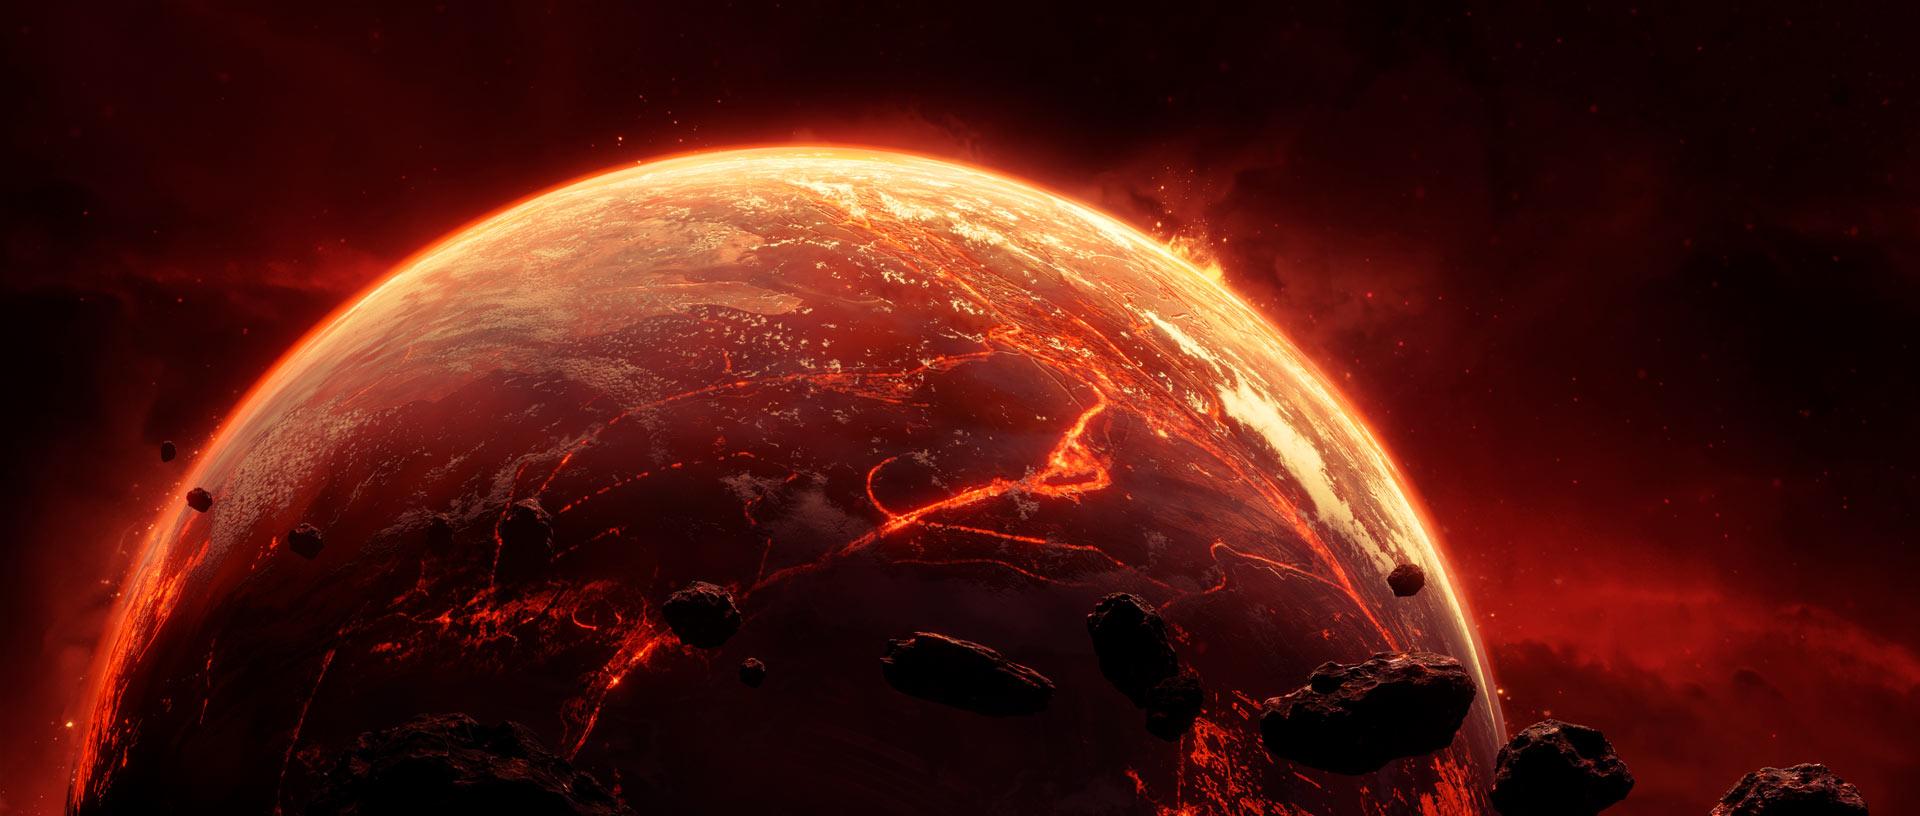 Black Hole Tutorial for Blender | Space VFX Freebie